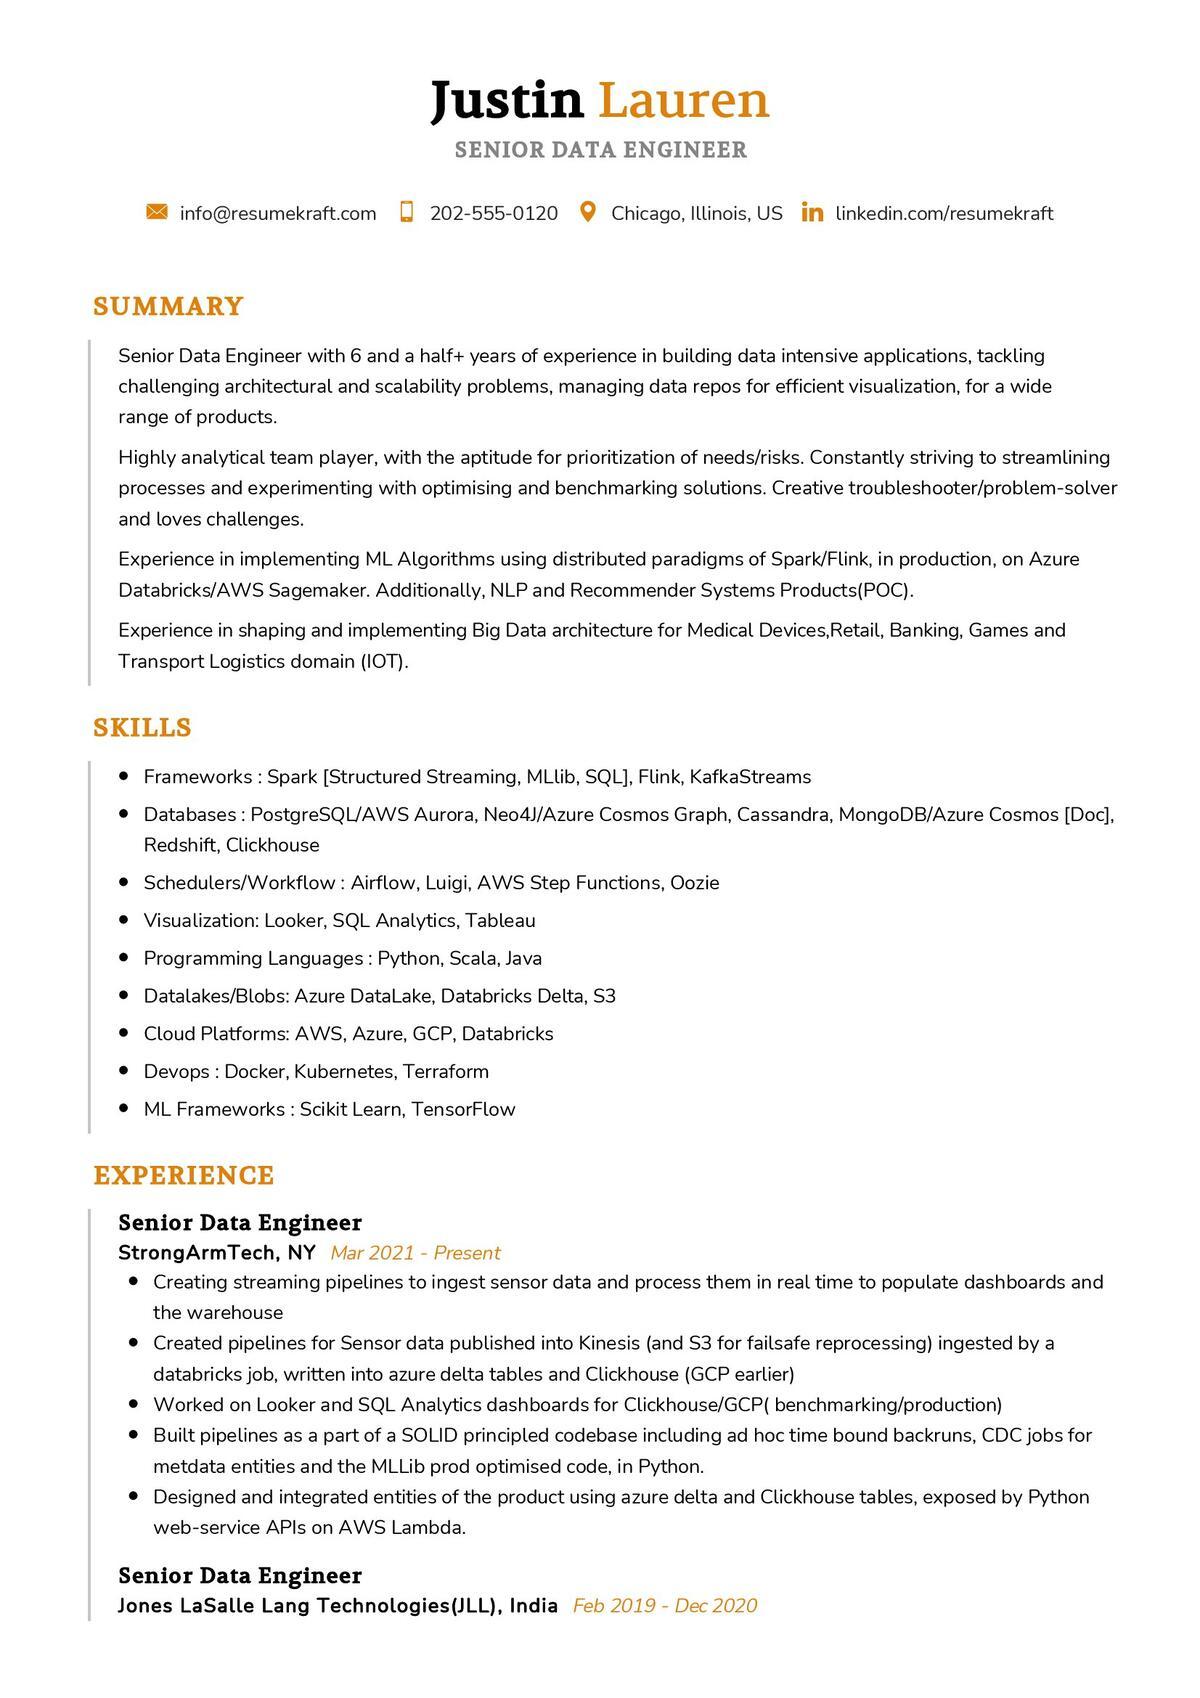 Senior Data Engineer CV Sample